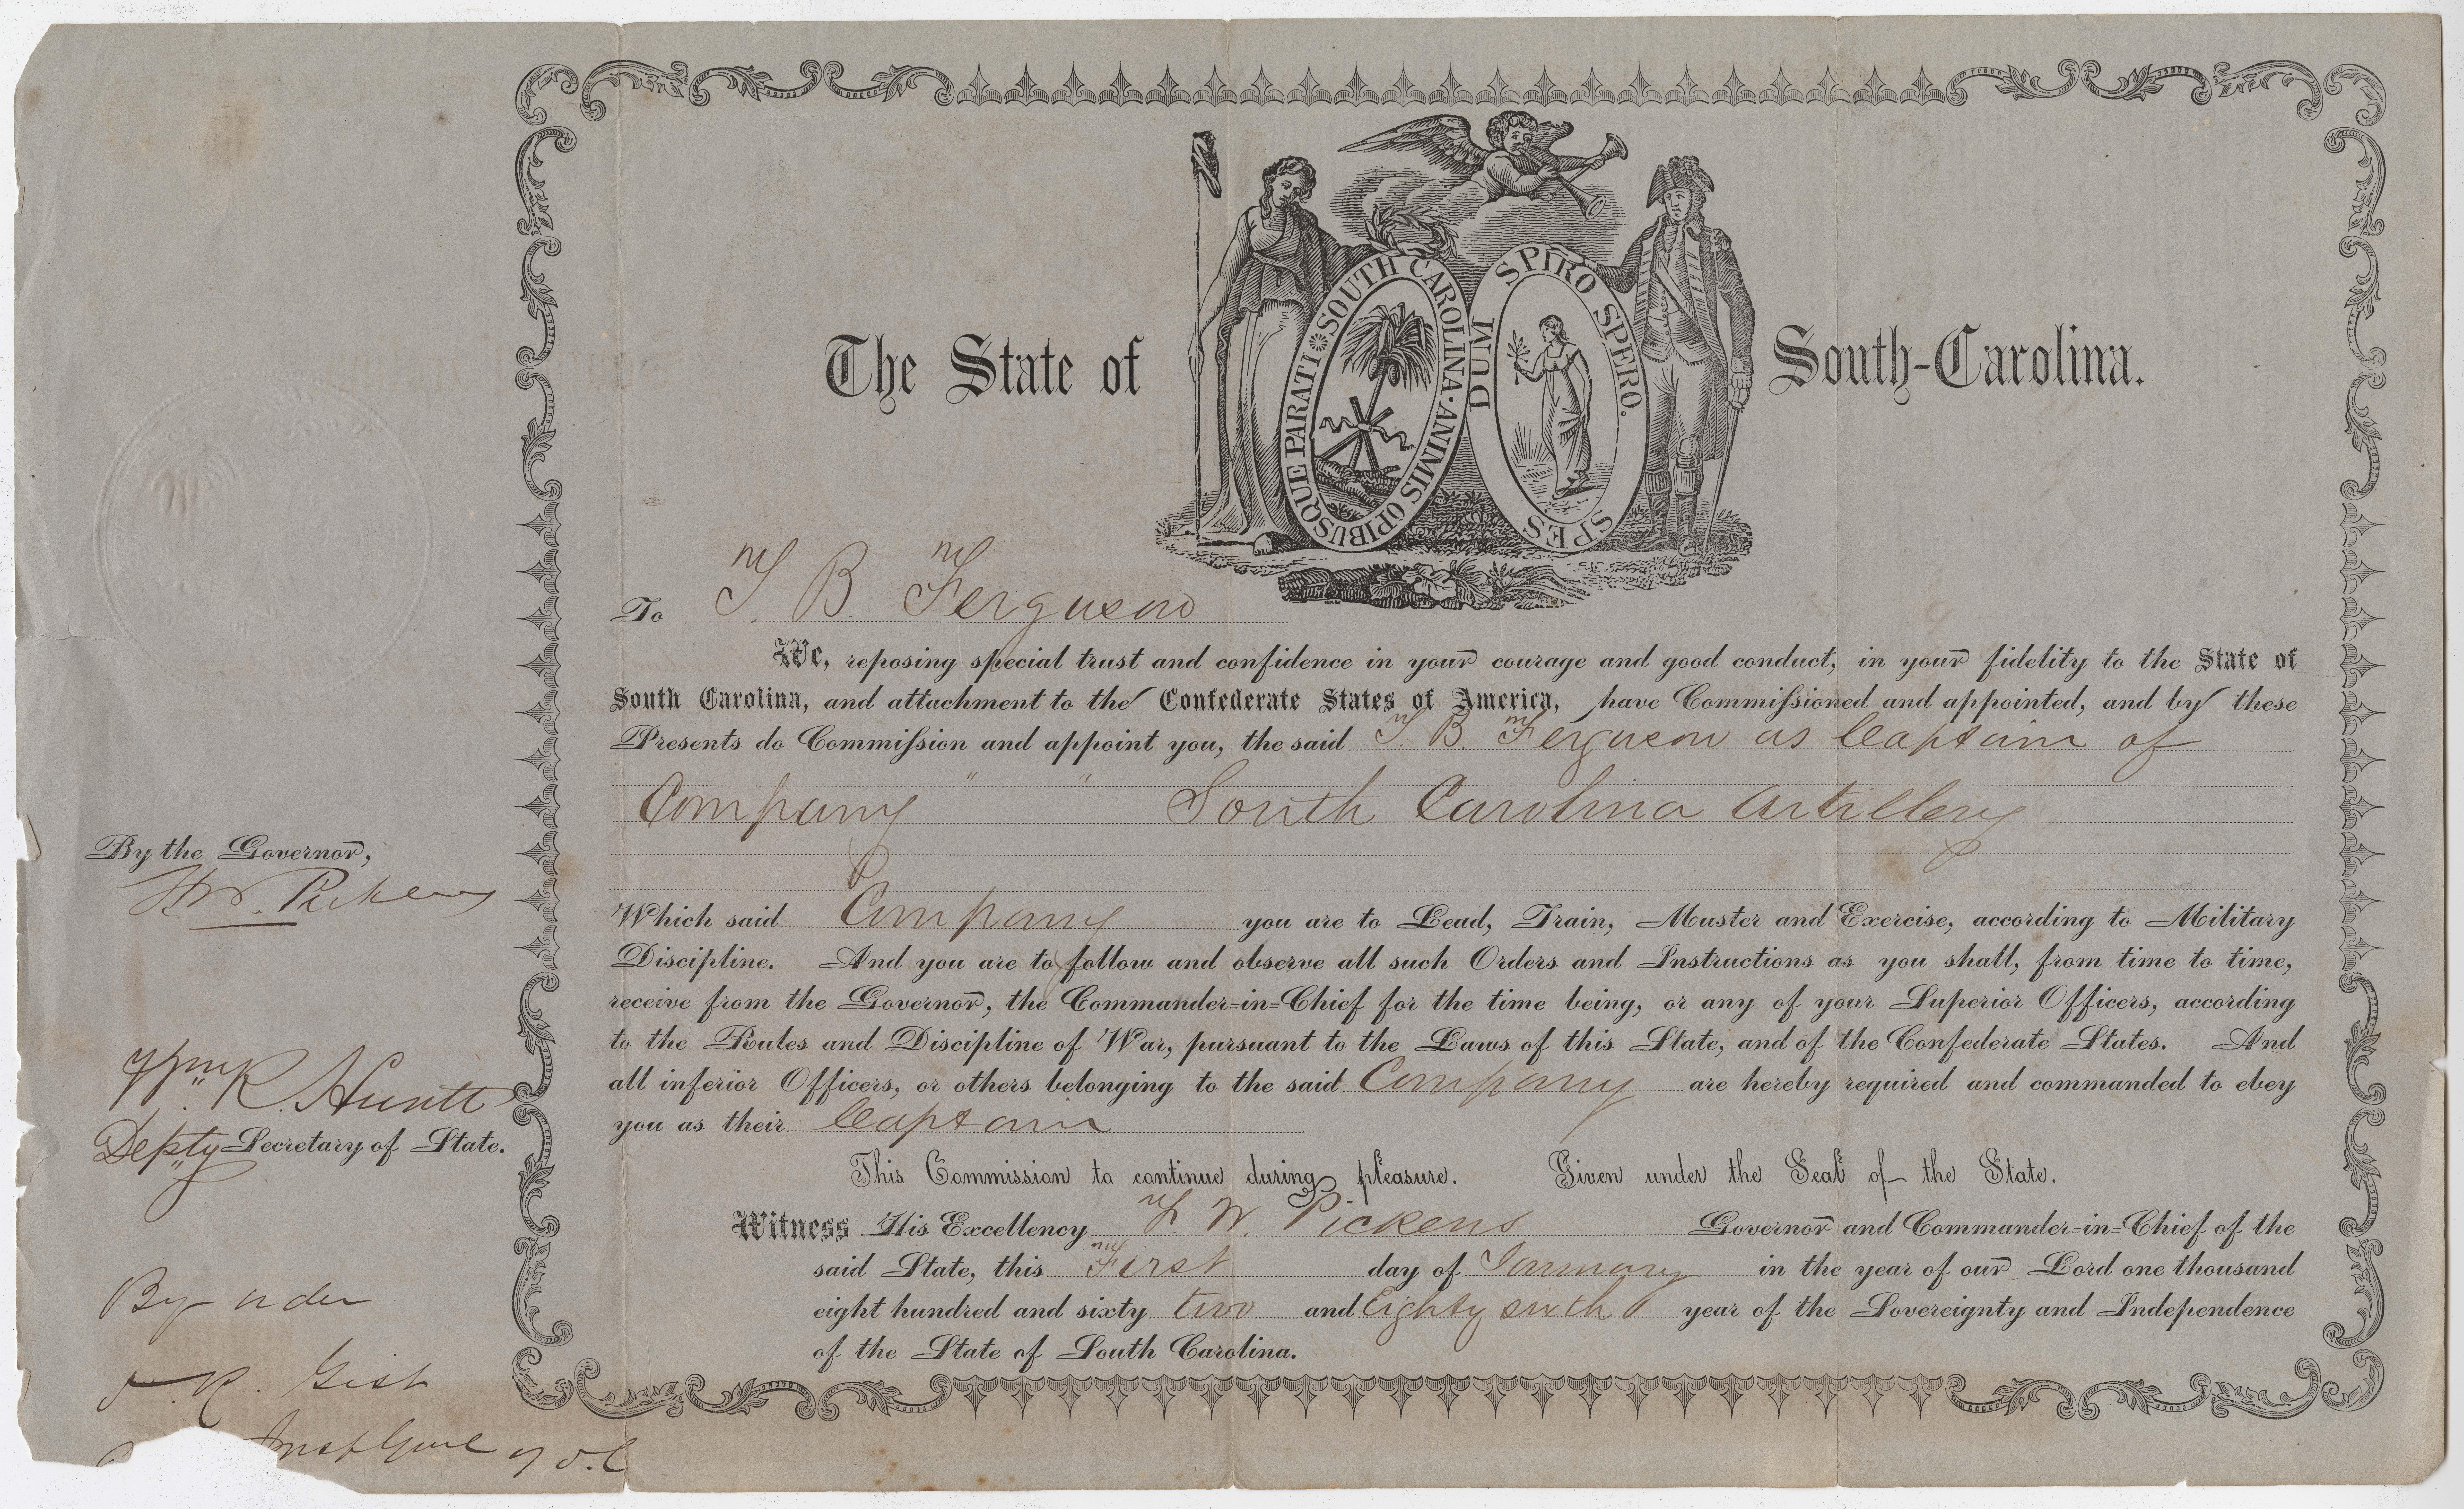 185. Commission of Thomas B. Ferguson to the South Carolina Artillery -- January 1, 1862